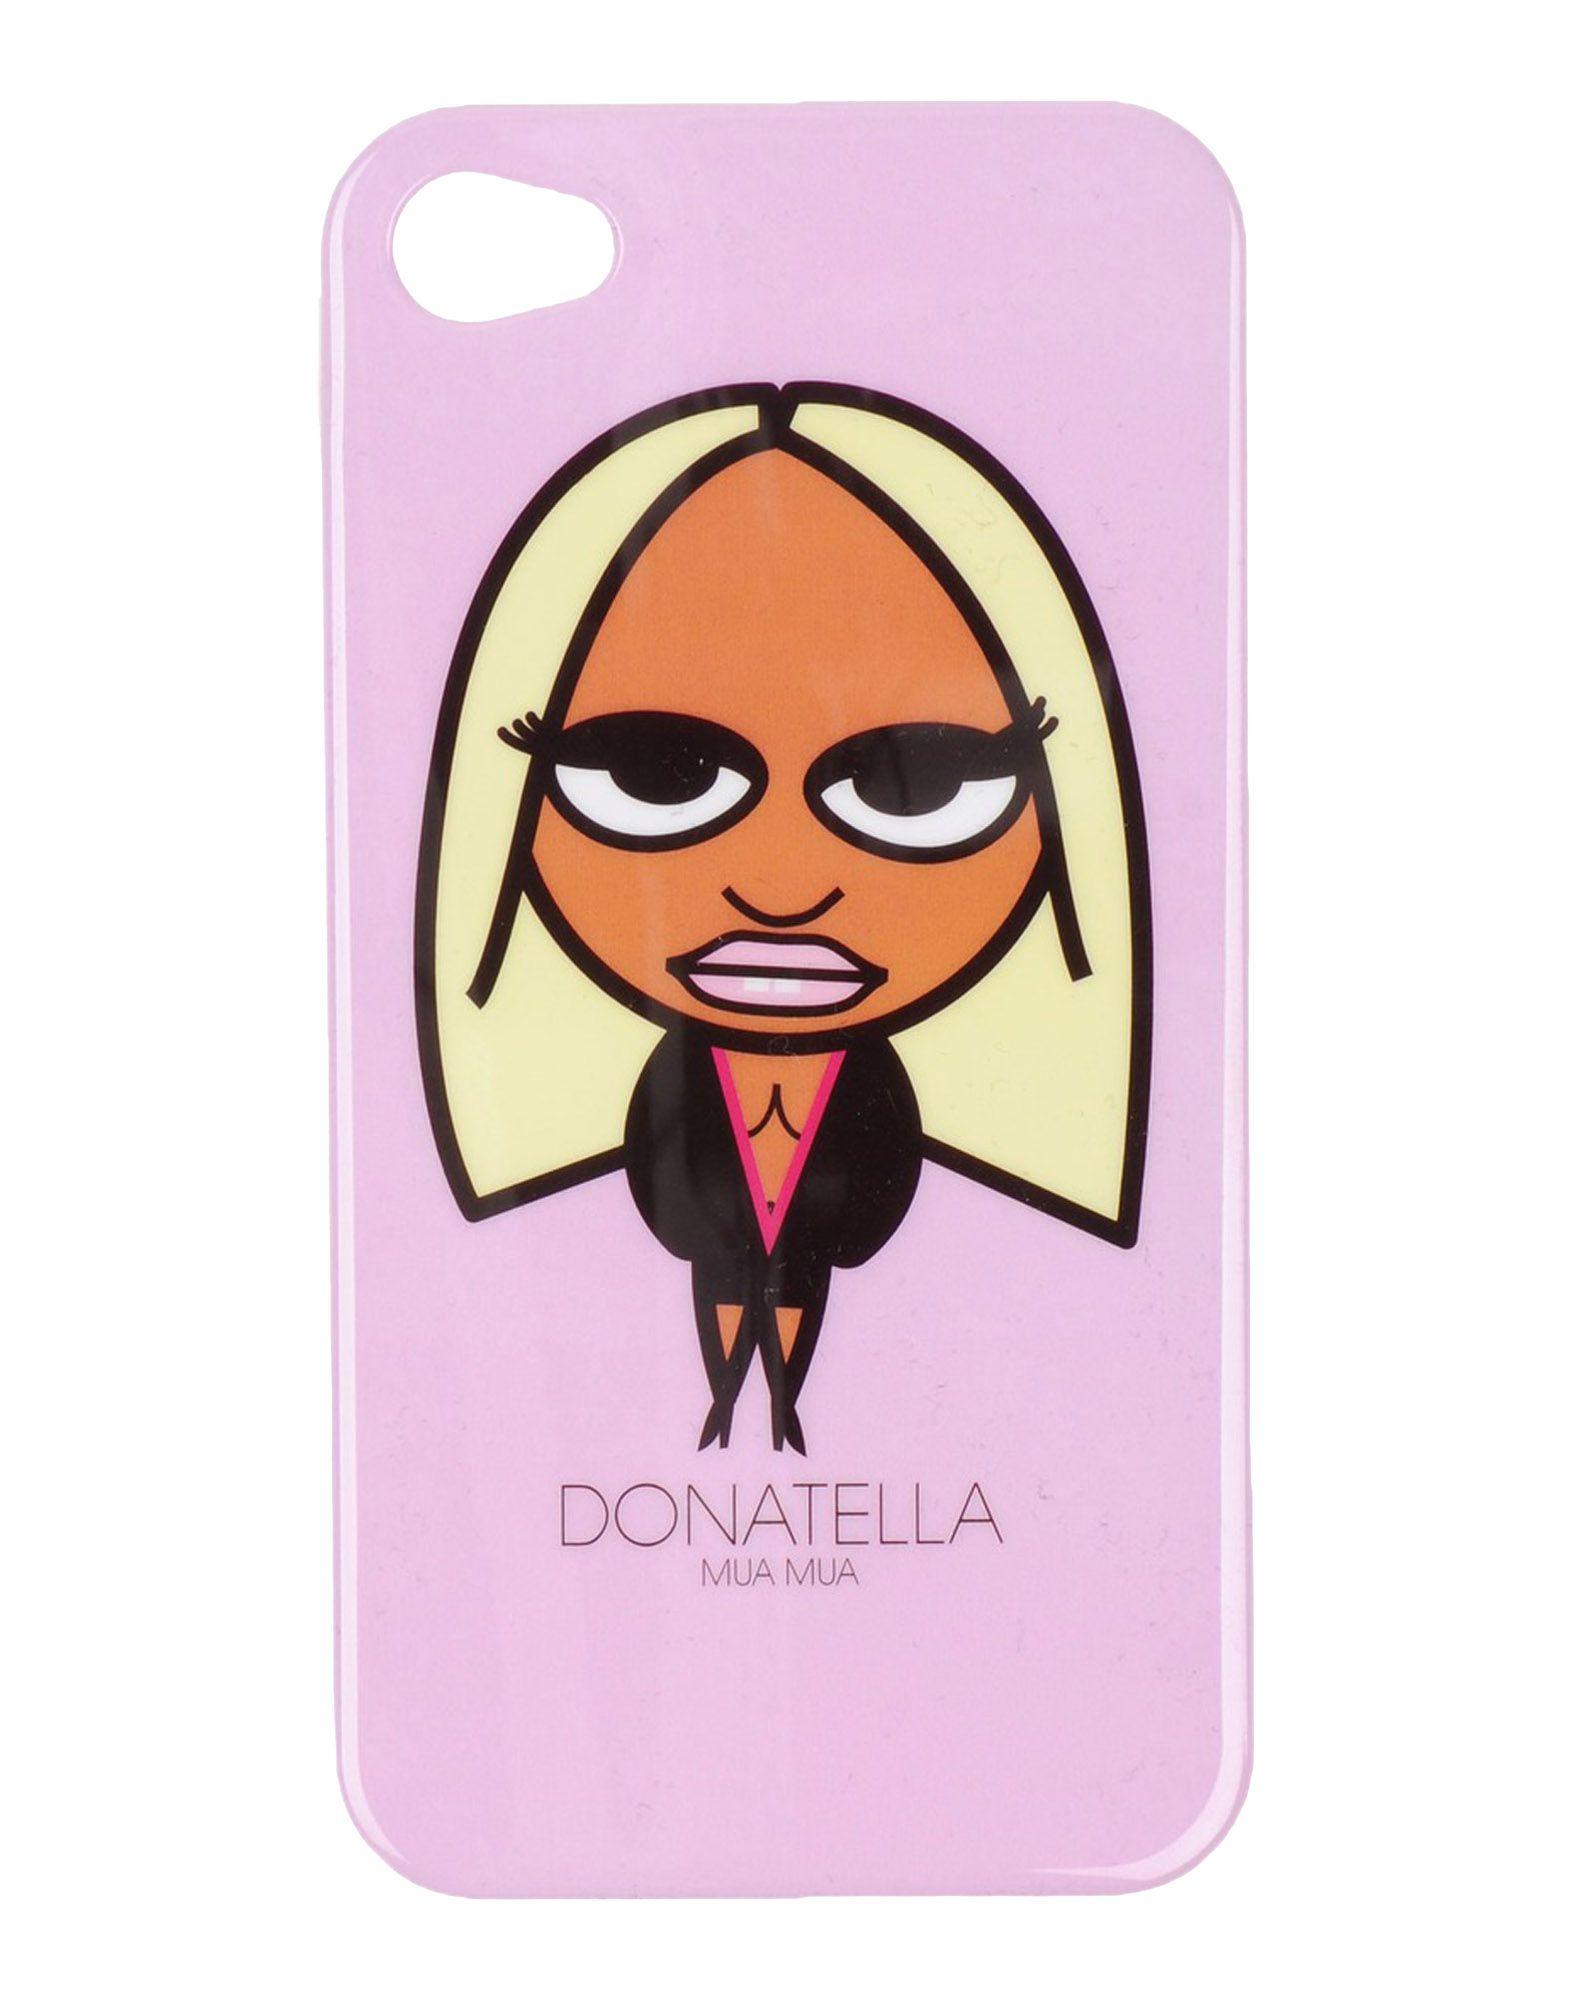 THE MUA MUA DOLLS Damen Hightech Accessoire Farbe Rosa Größe 1